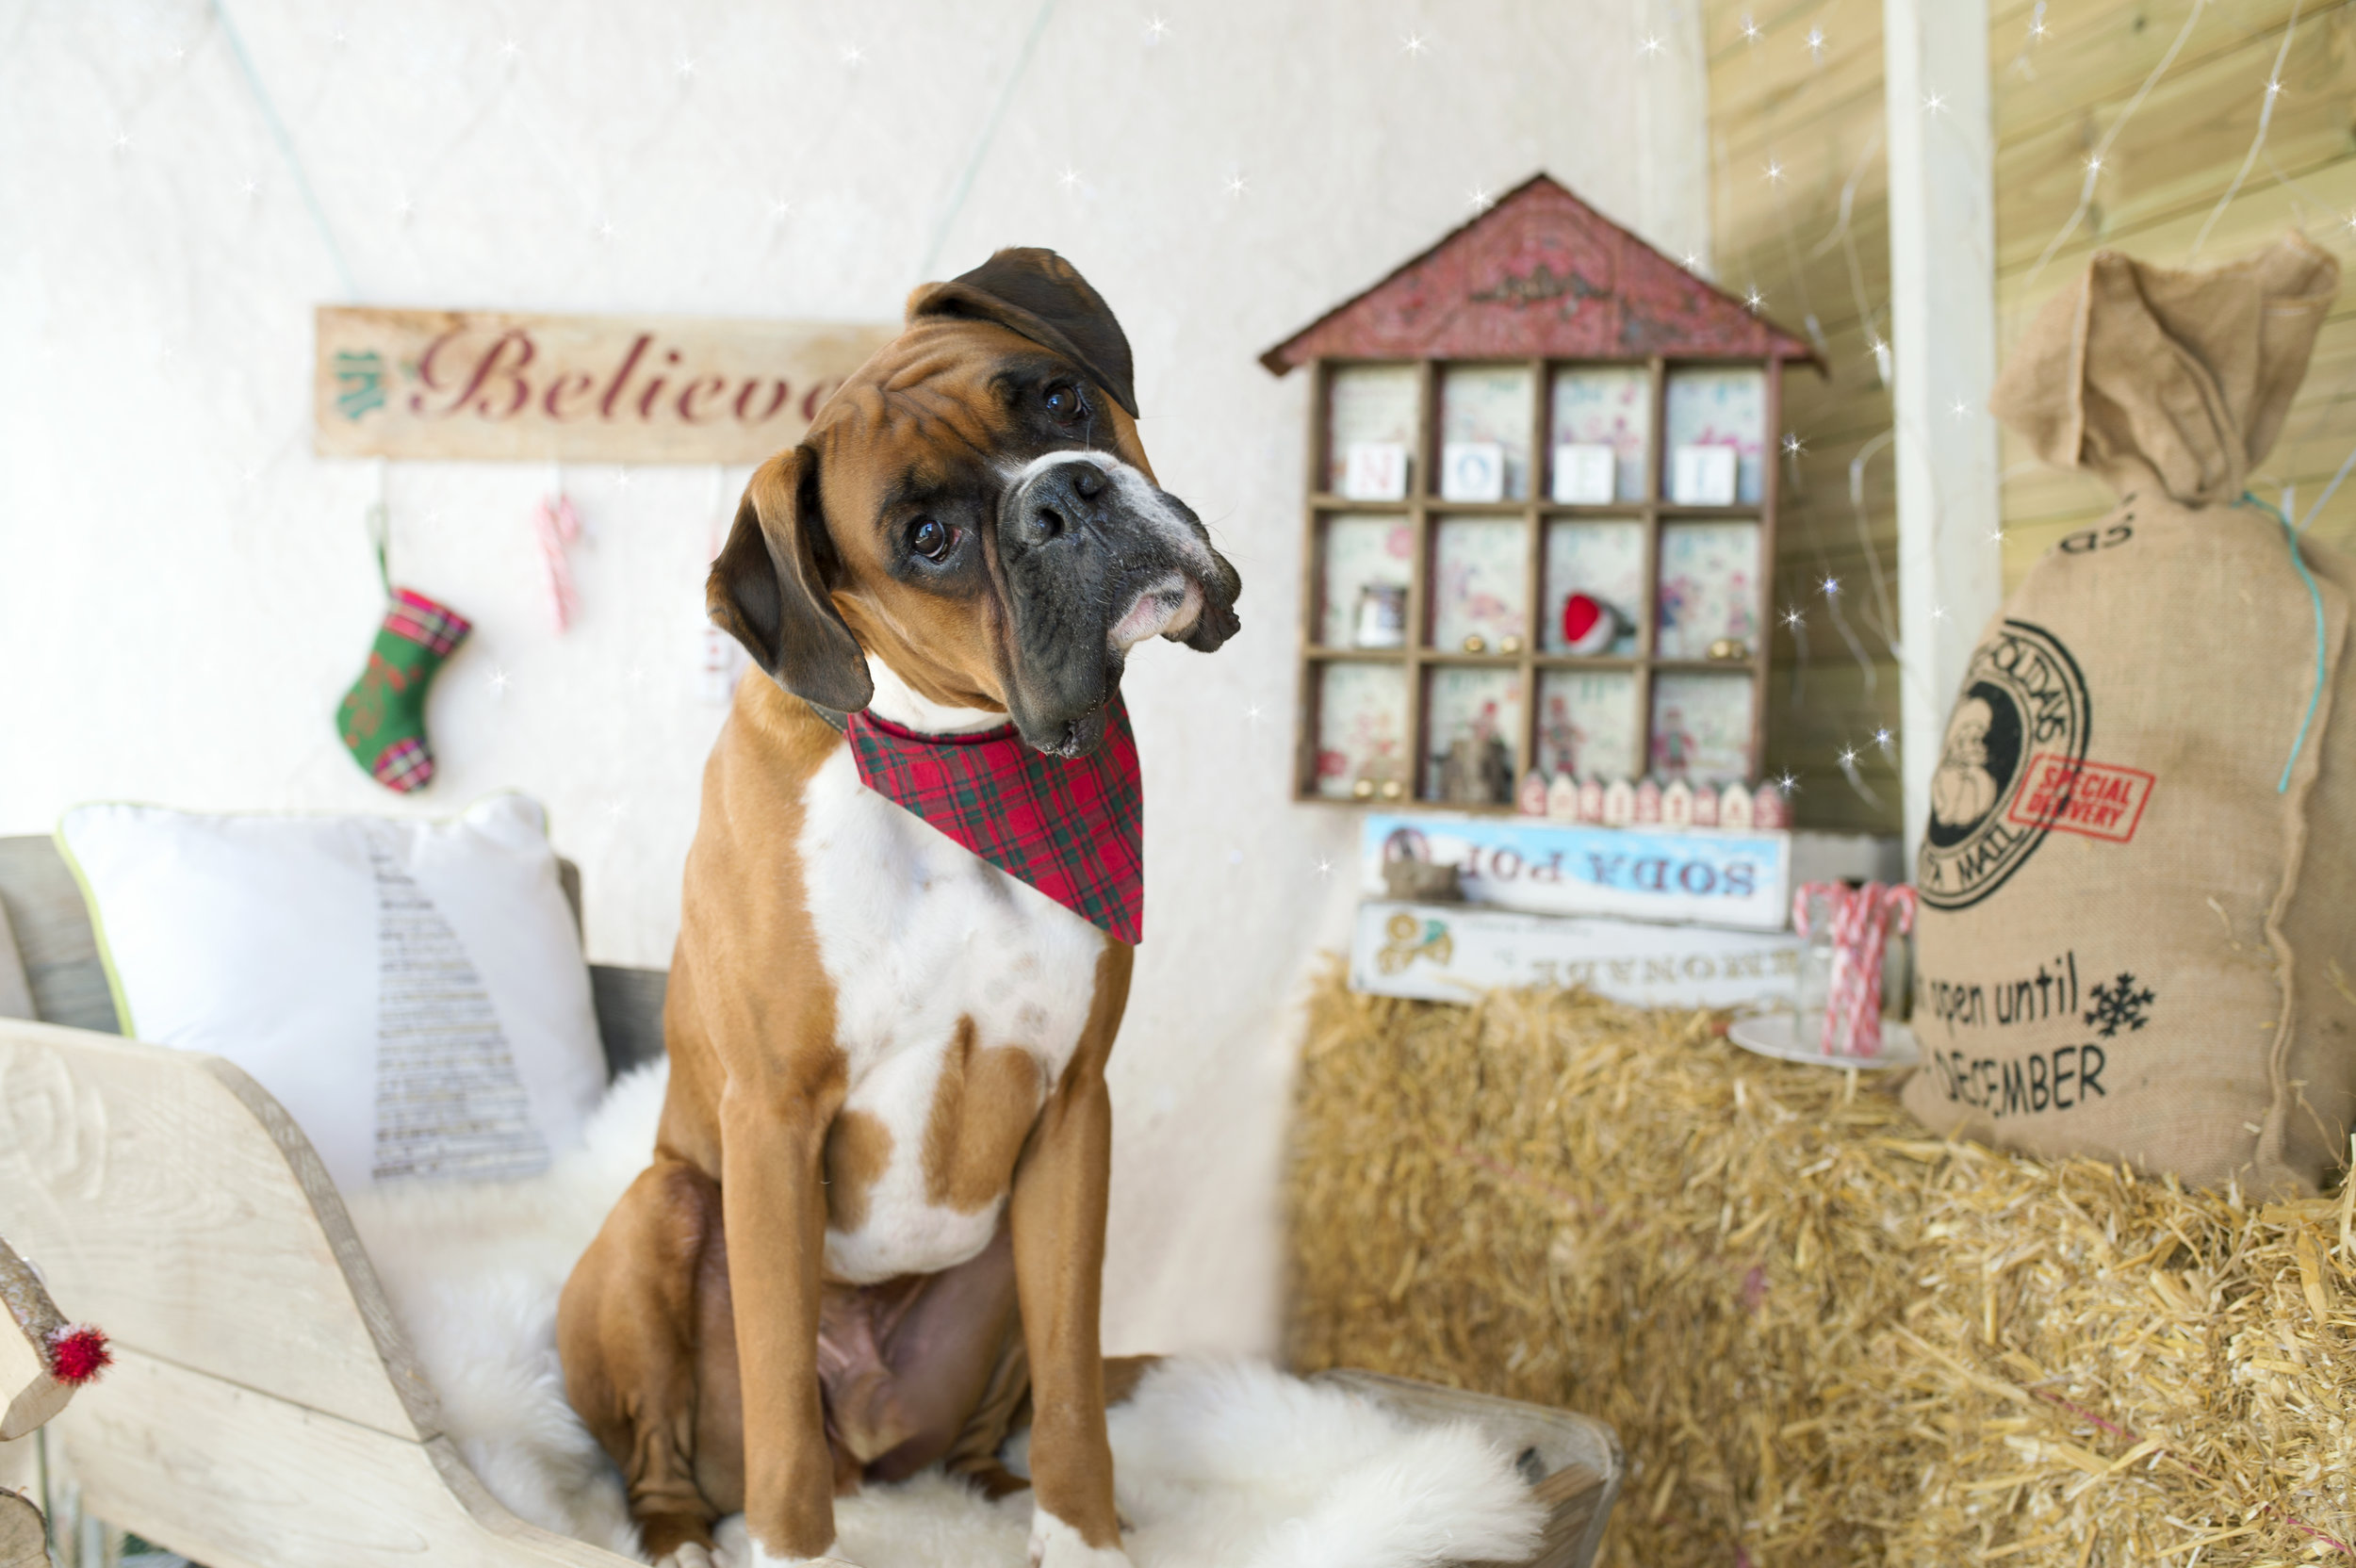 Boomer the dog enjoying his Christmas photography session!